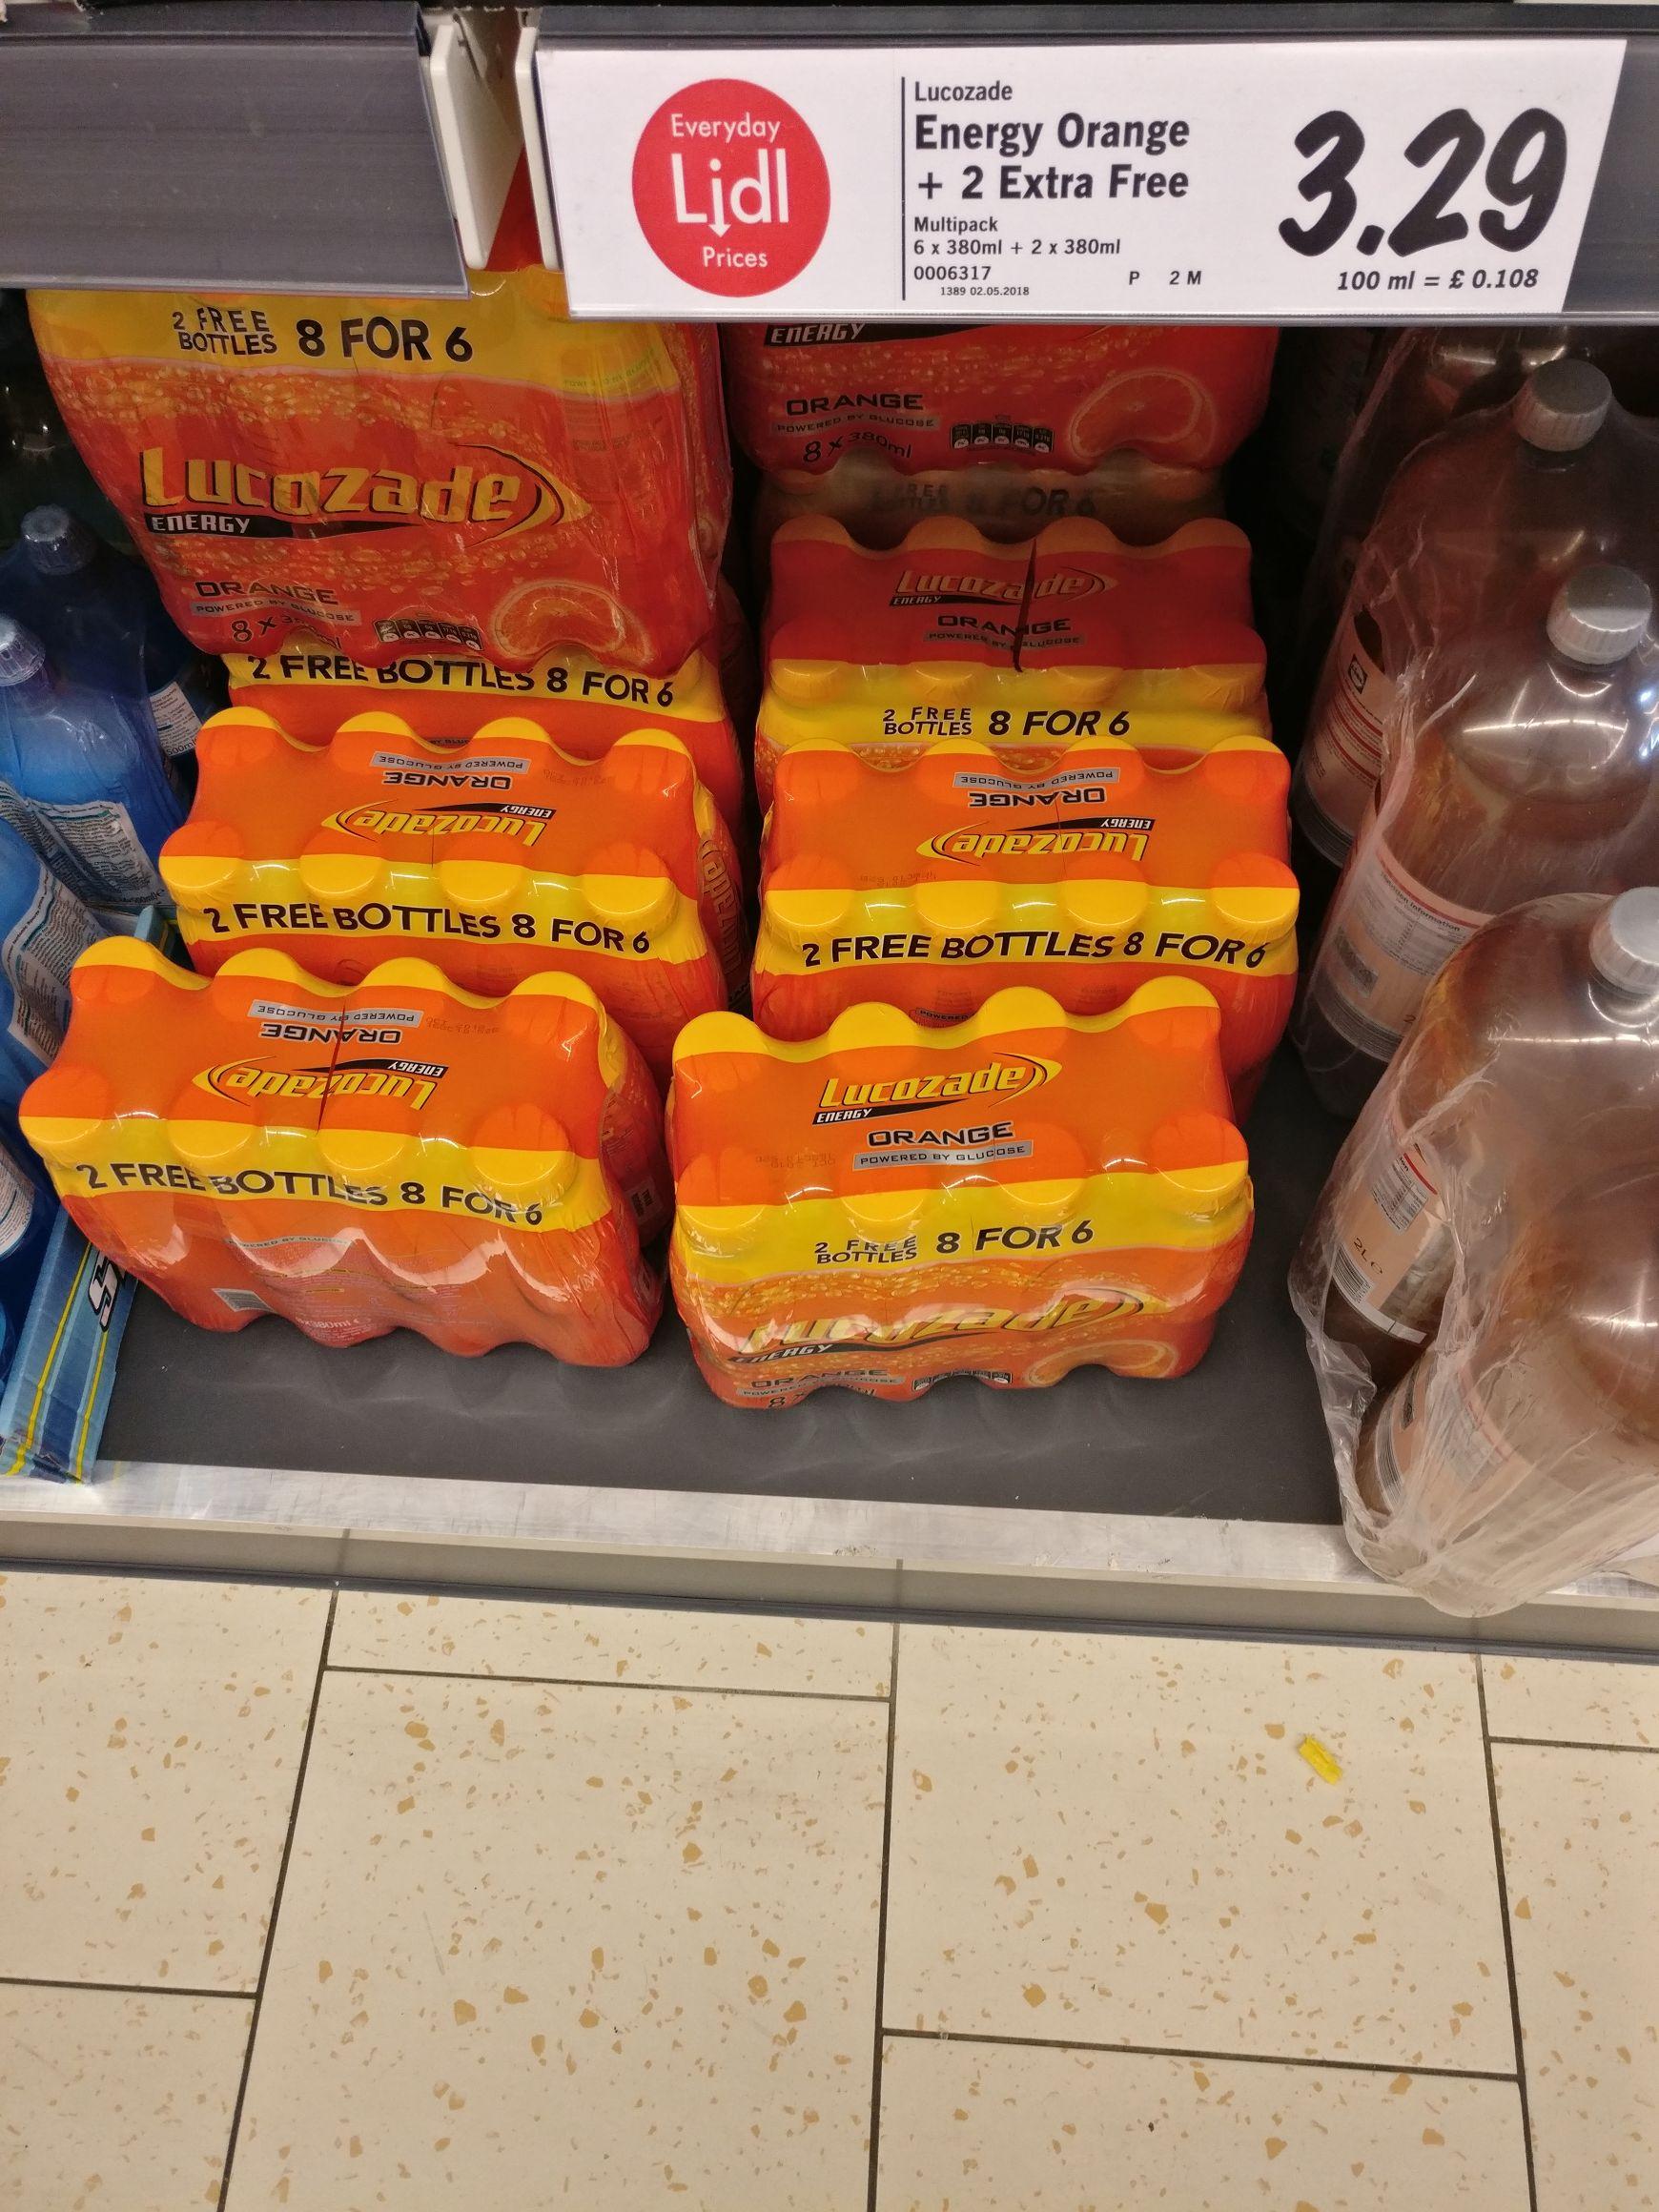 8 x 380ml lucozade bottles for £3.29 at Lidl instore